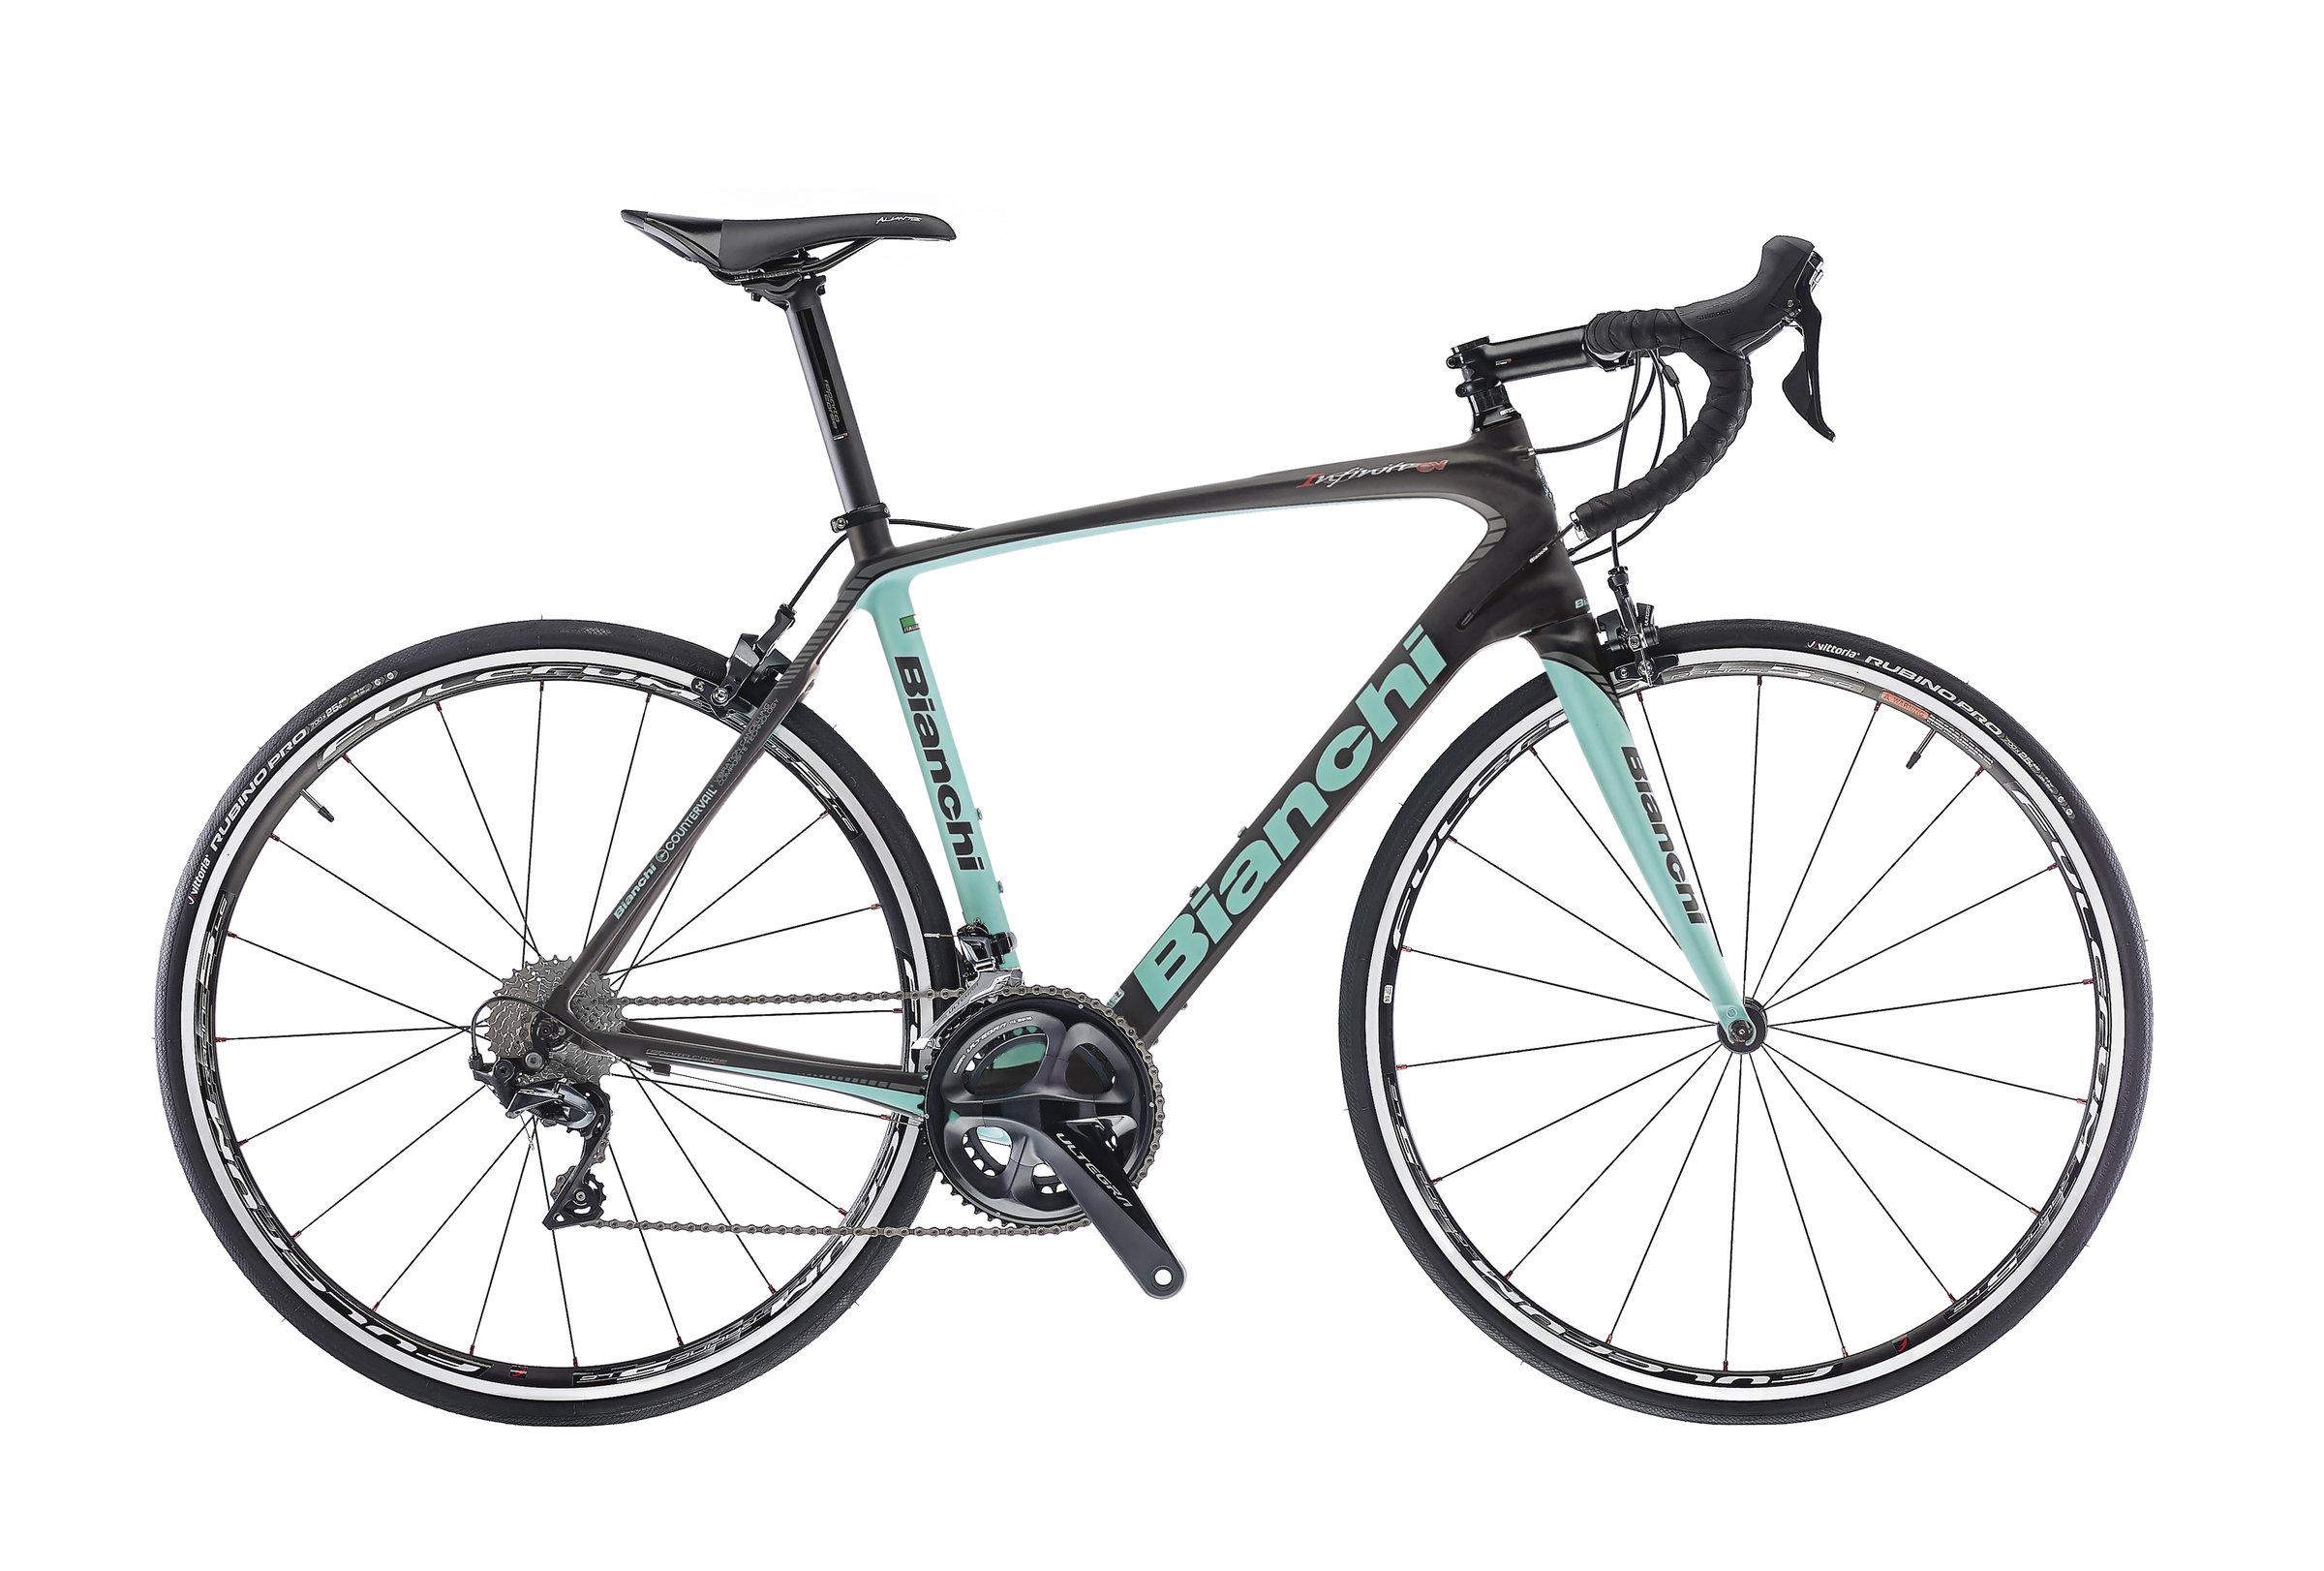 Bianchi Infinito Cv Ultegra Bicycles Pleasanton Low